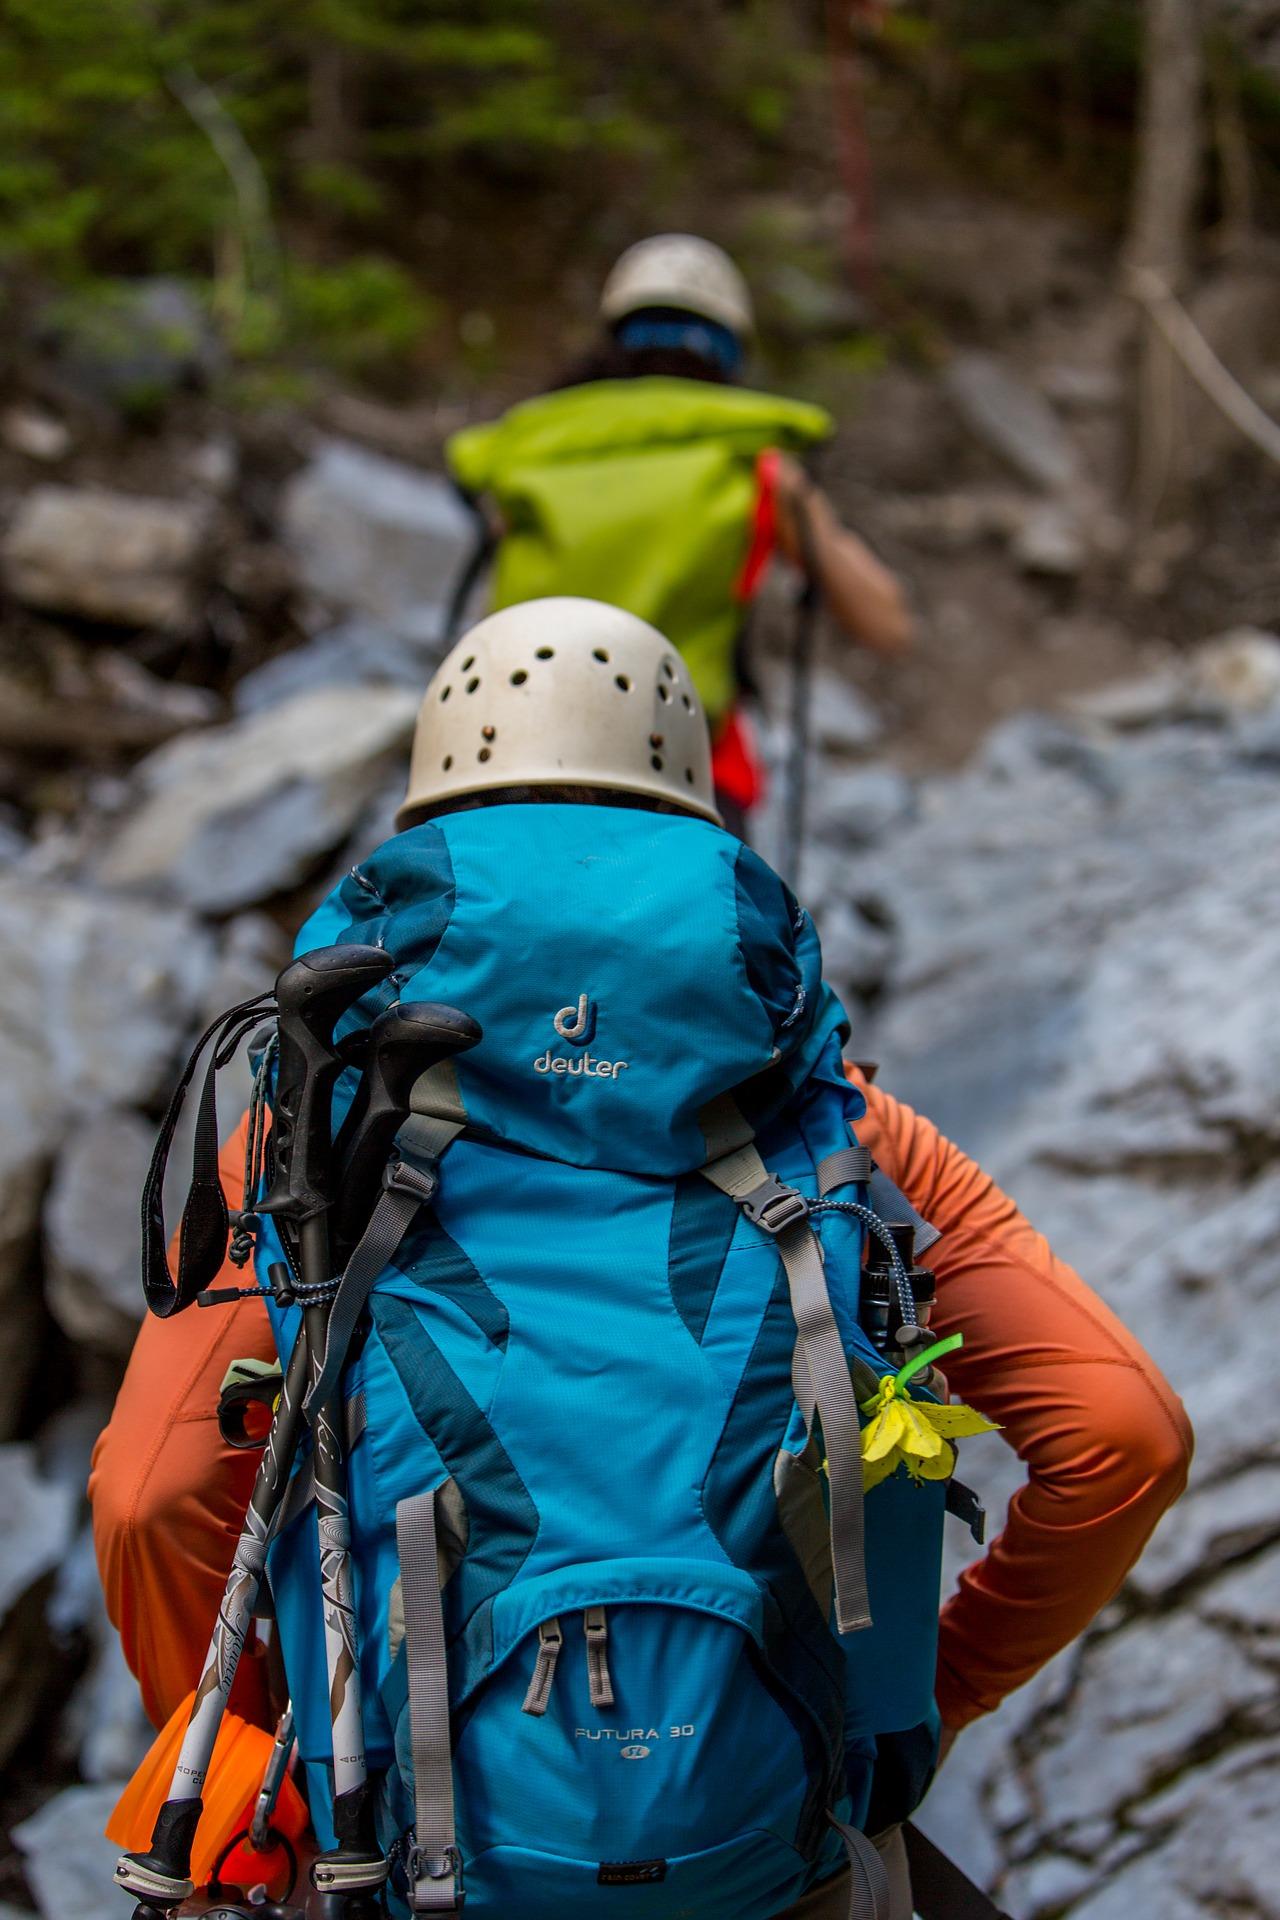 2d72e249de テント泊登山におすすめなバックパック3選 マウンテンシティメディア